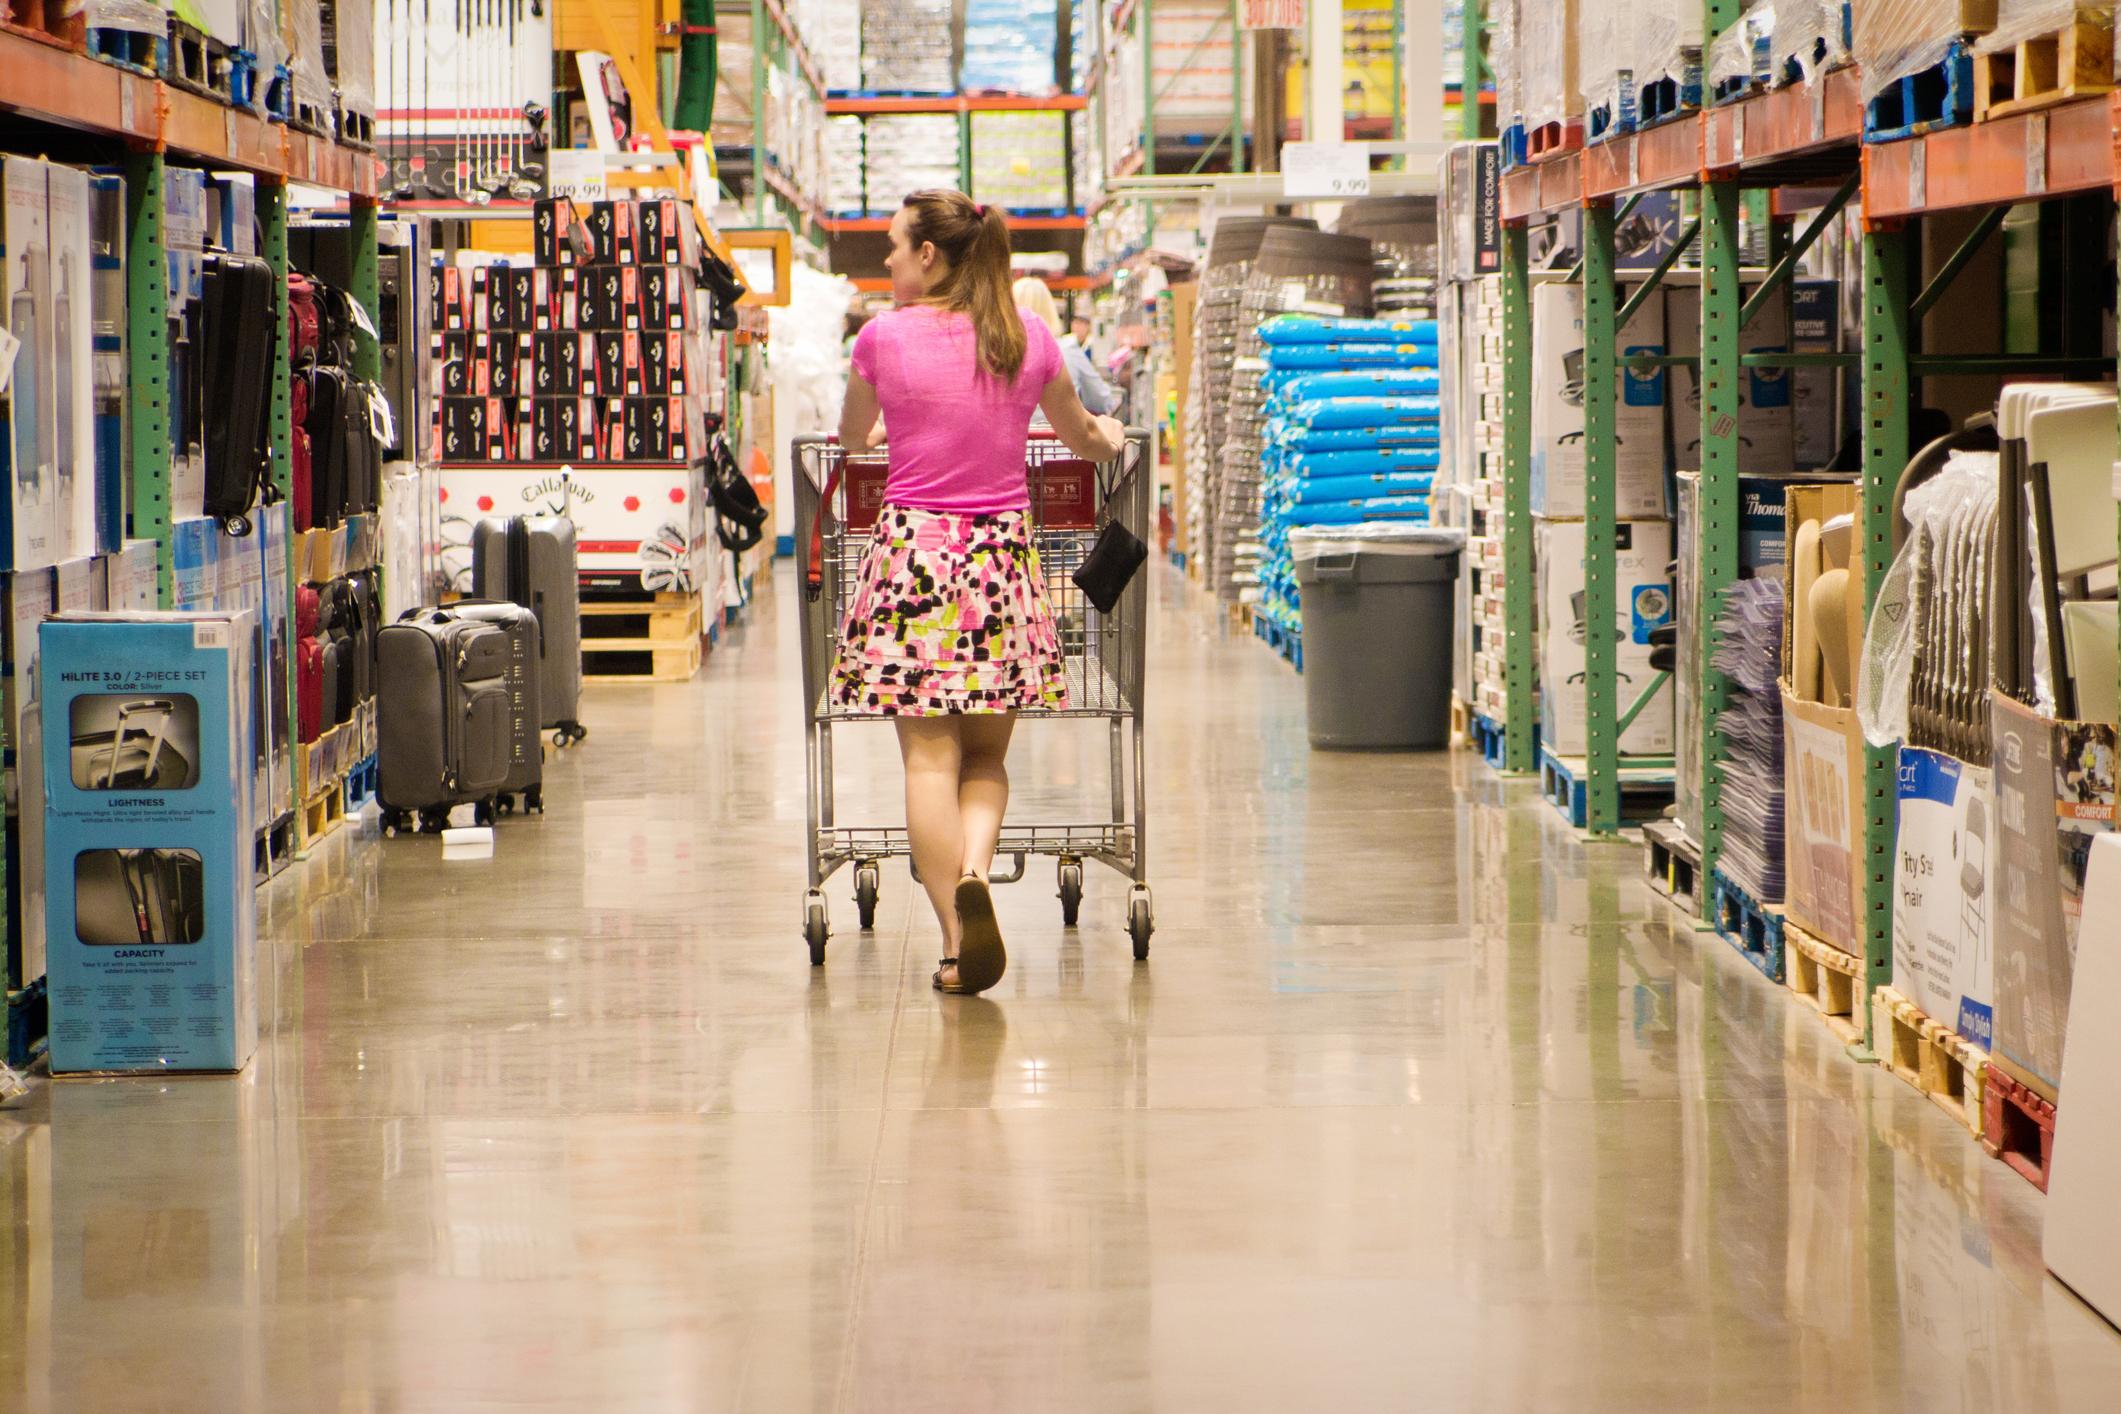 A customer browses the aisles at a warehouse retailer.